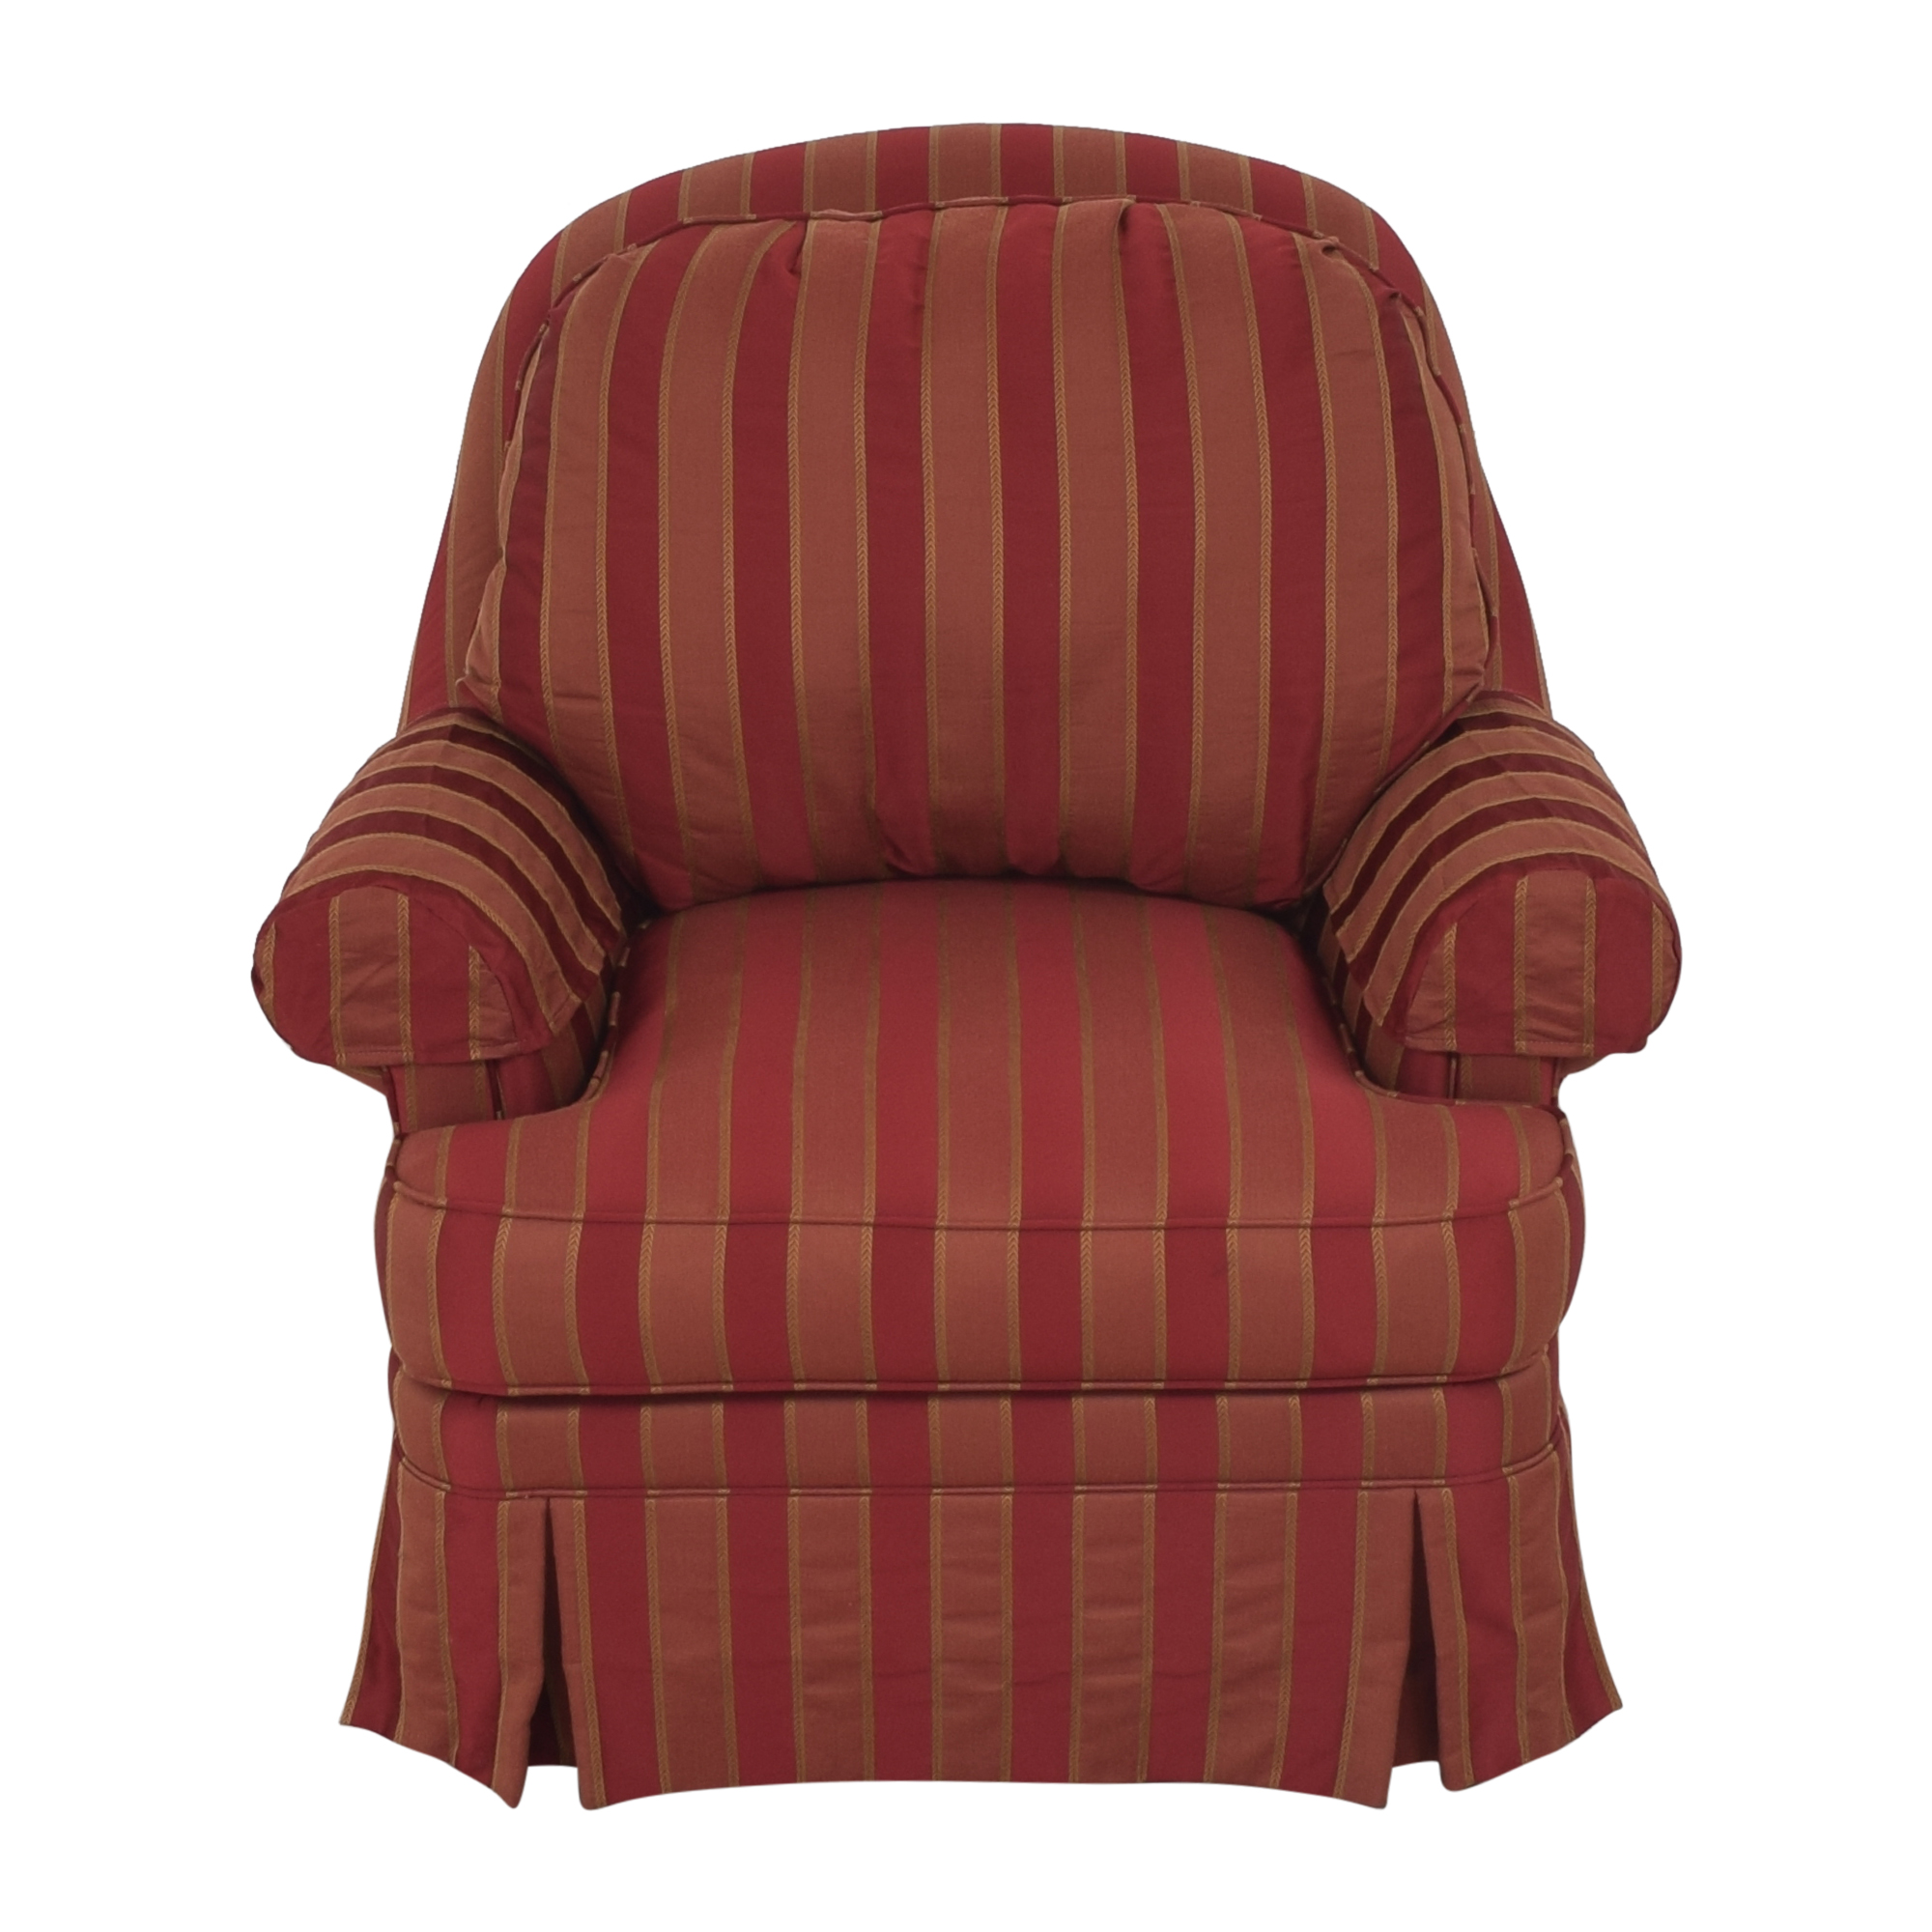 Ethan Allen Ethan Allen Skirted Swivel Chair red